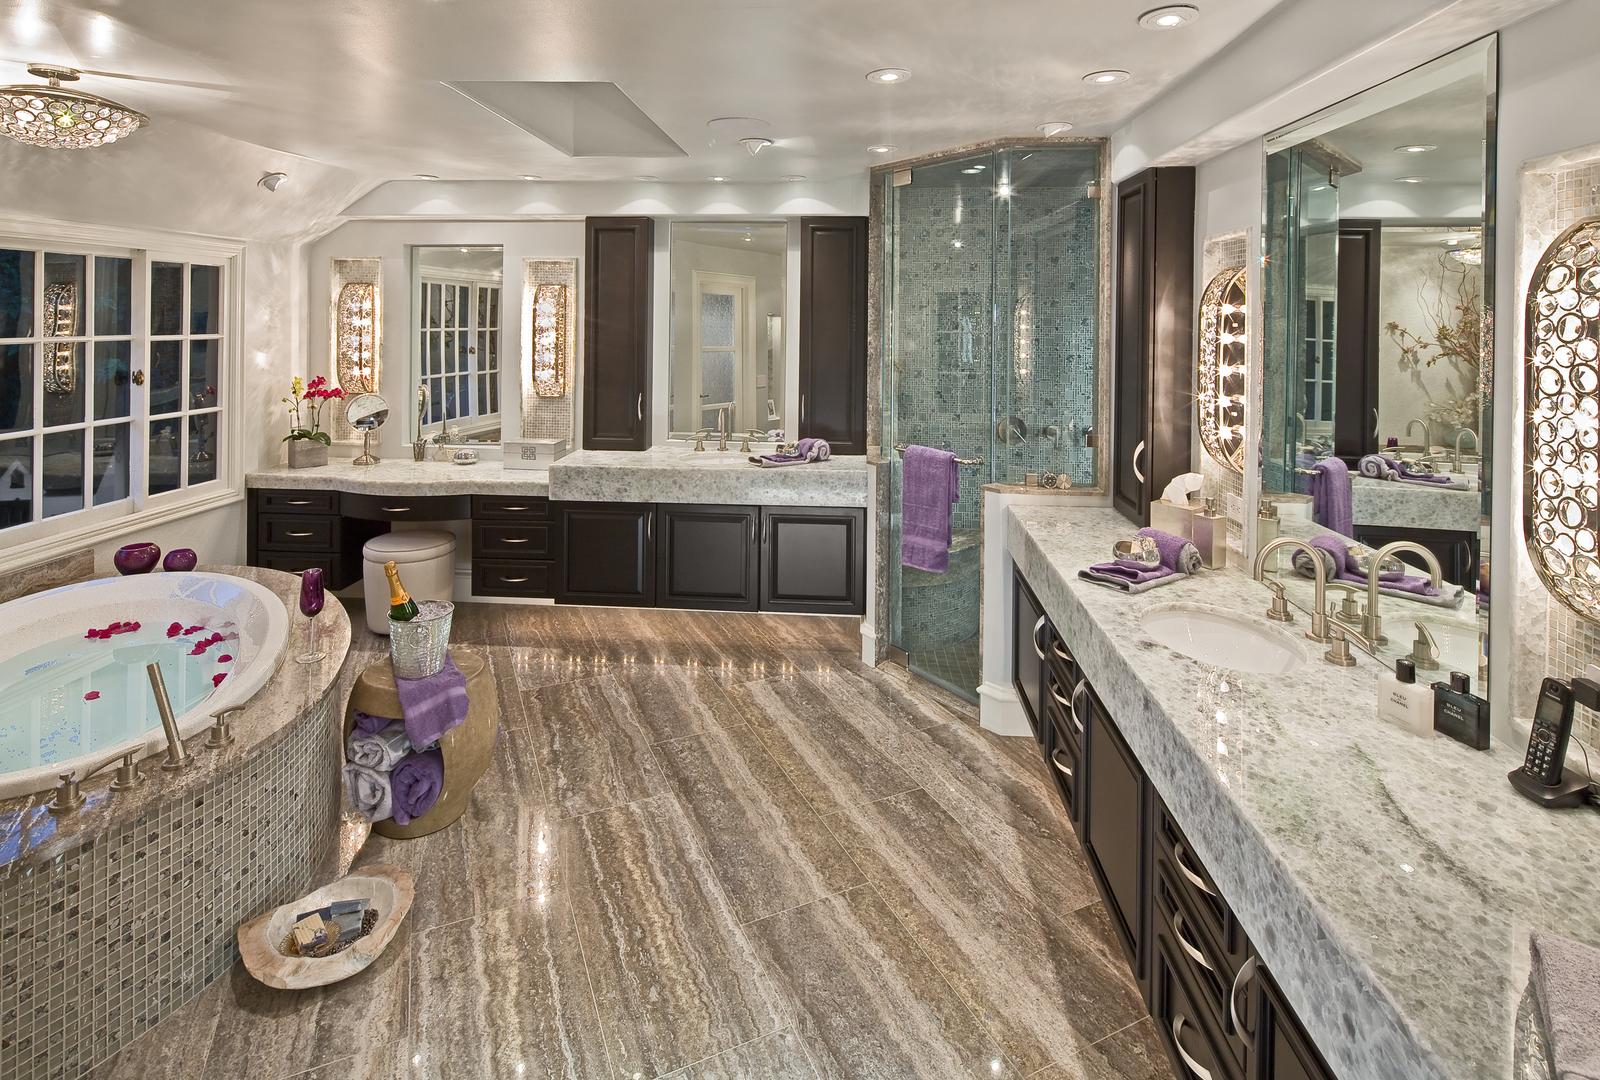 Kitchen And Bath Design - Elina Katsioula Beall